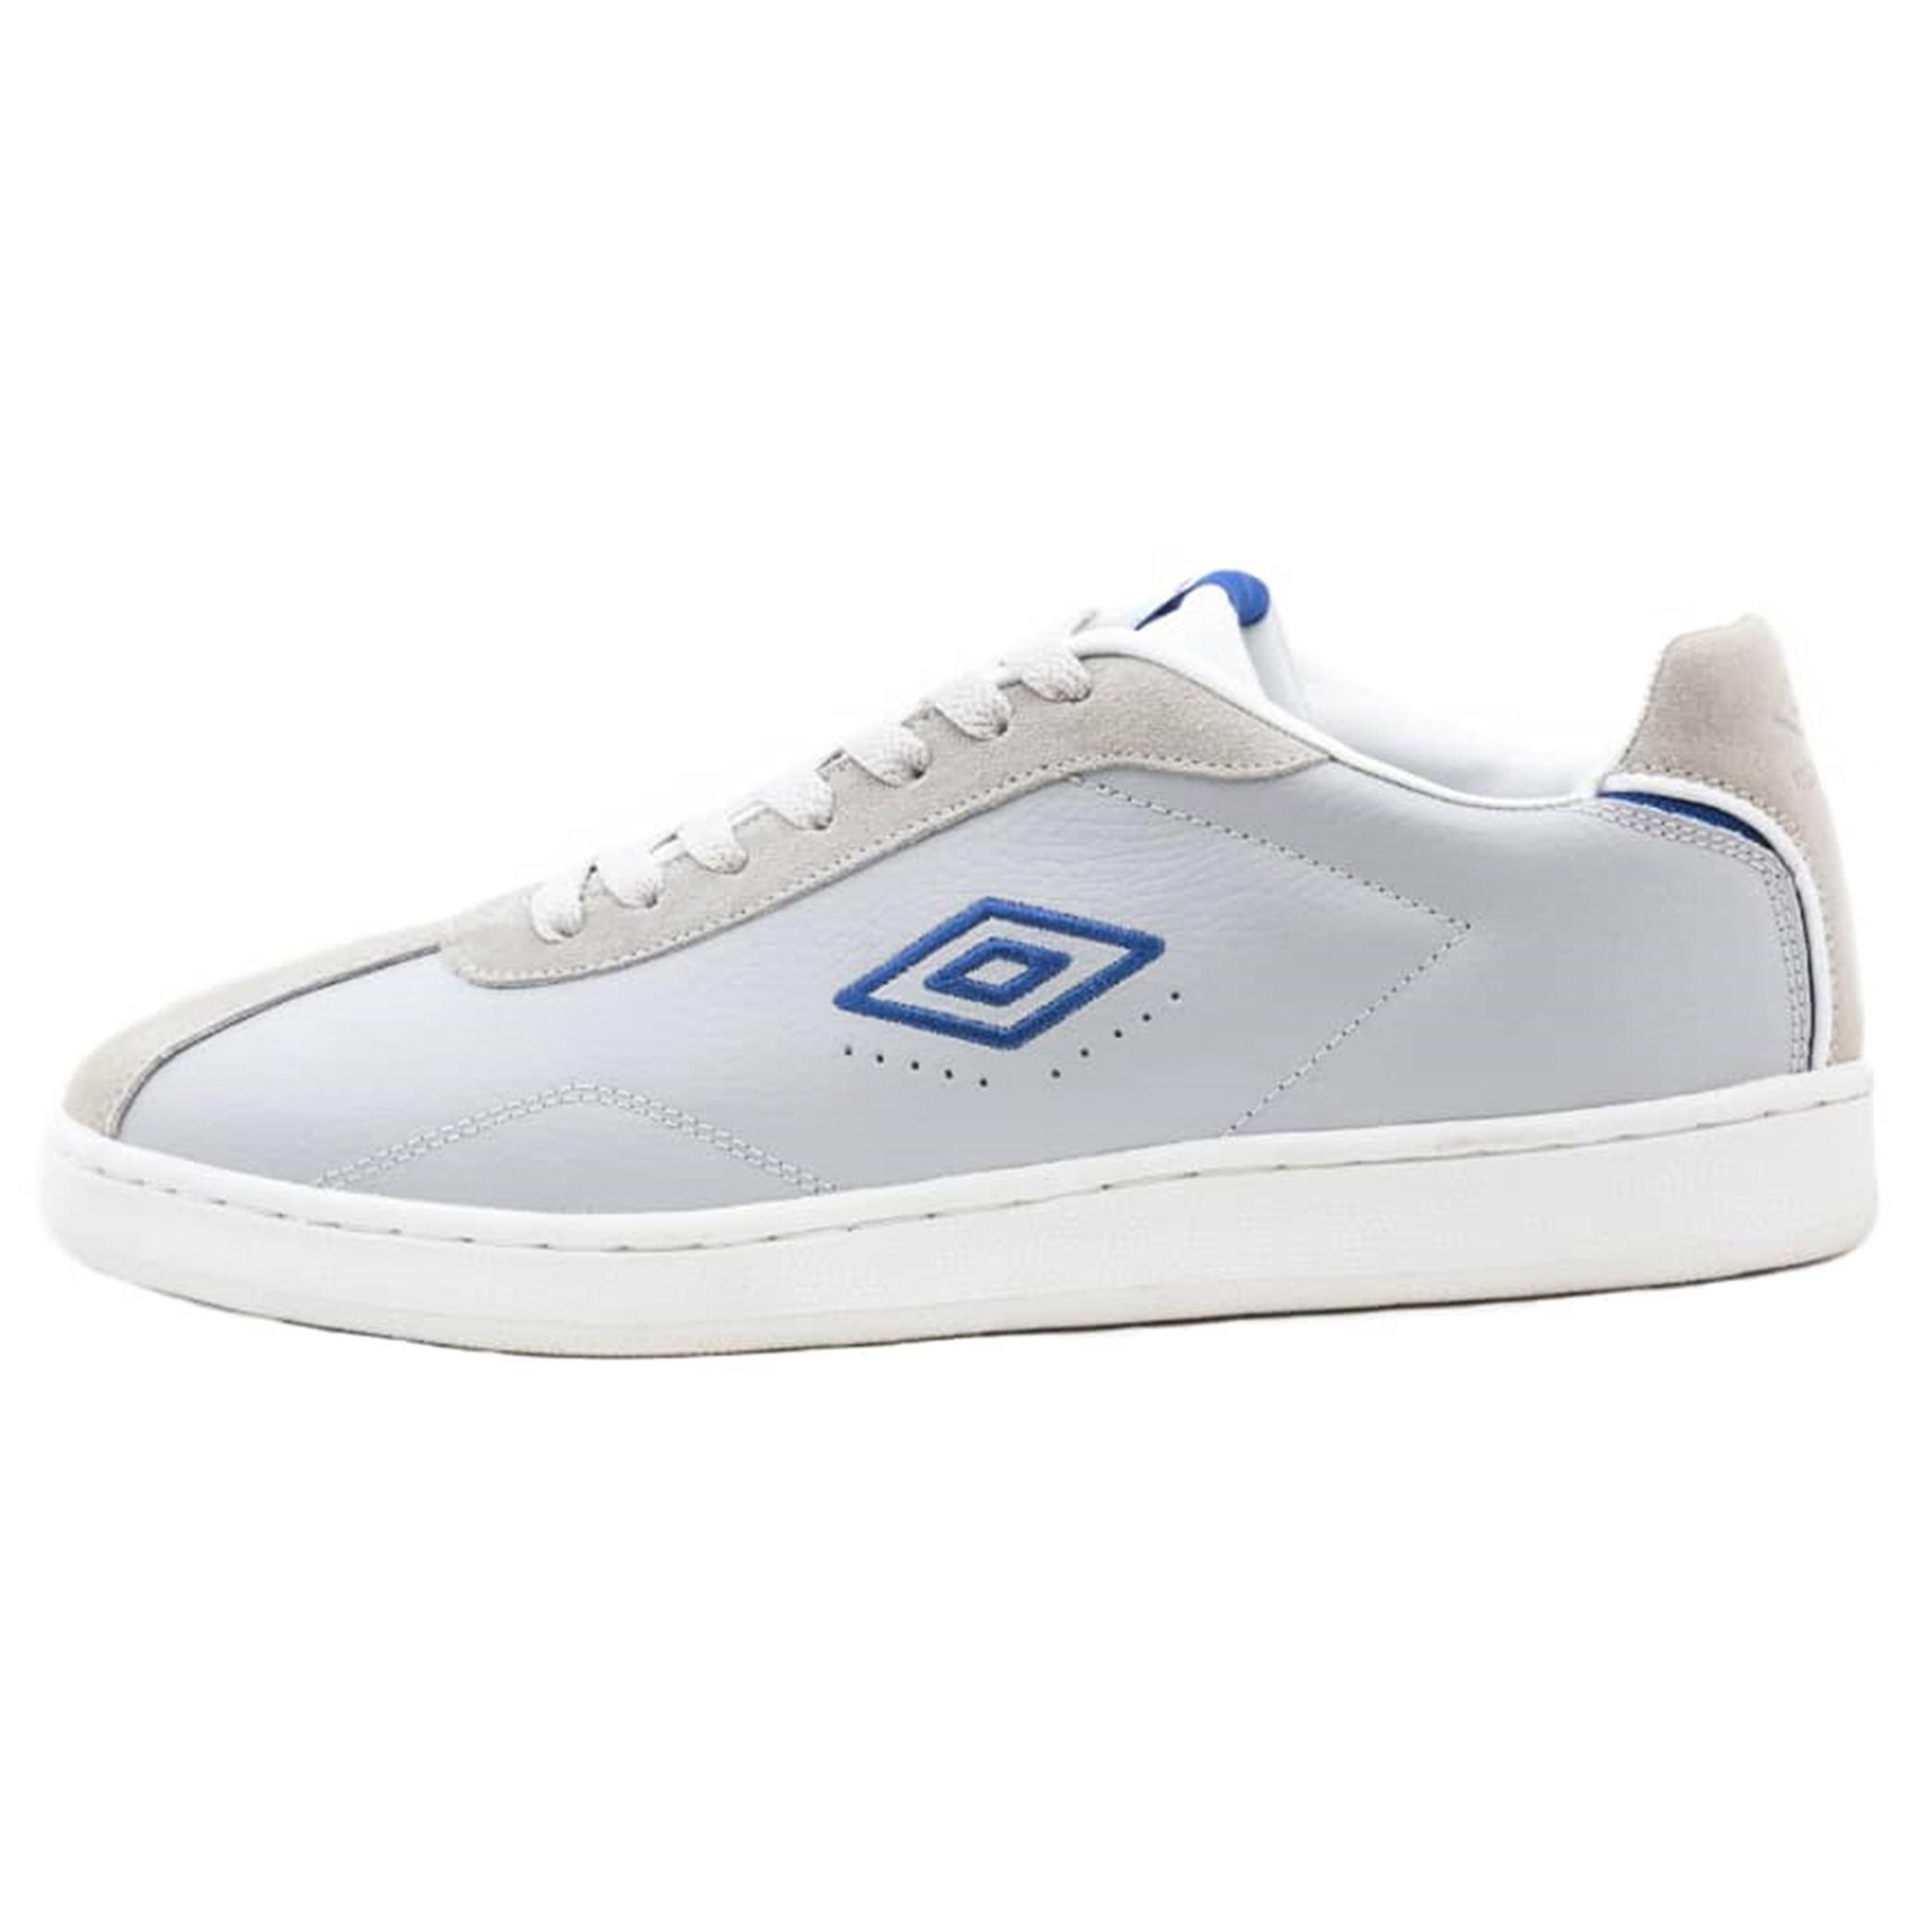 کفش راحتی مردانه آمبرو مدل GALAXY کد 20002